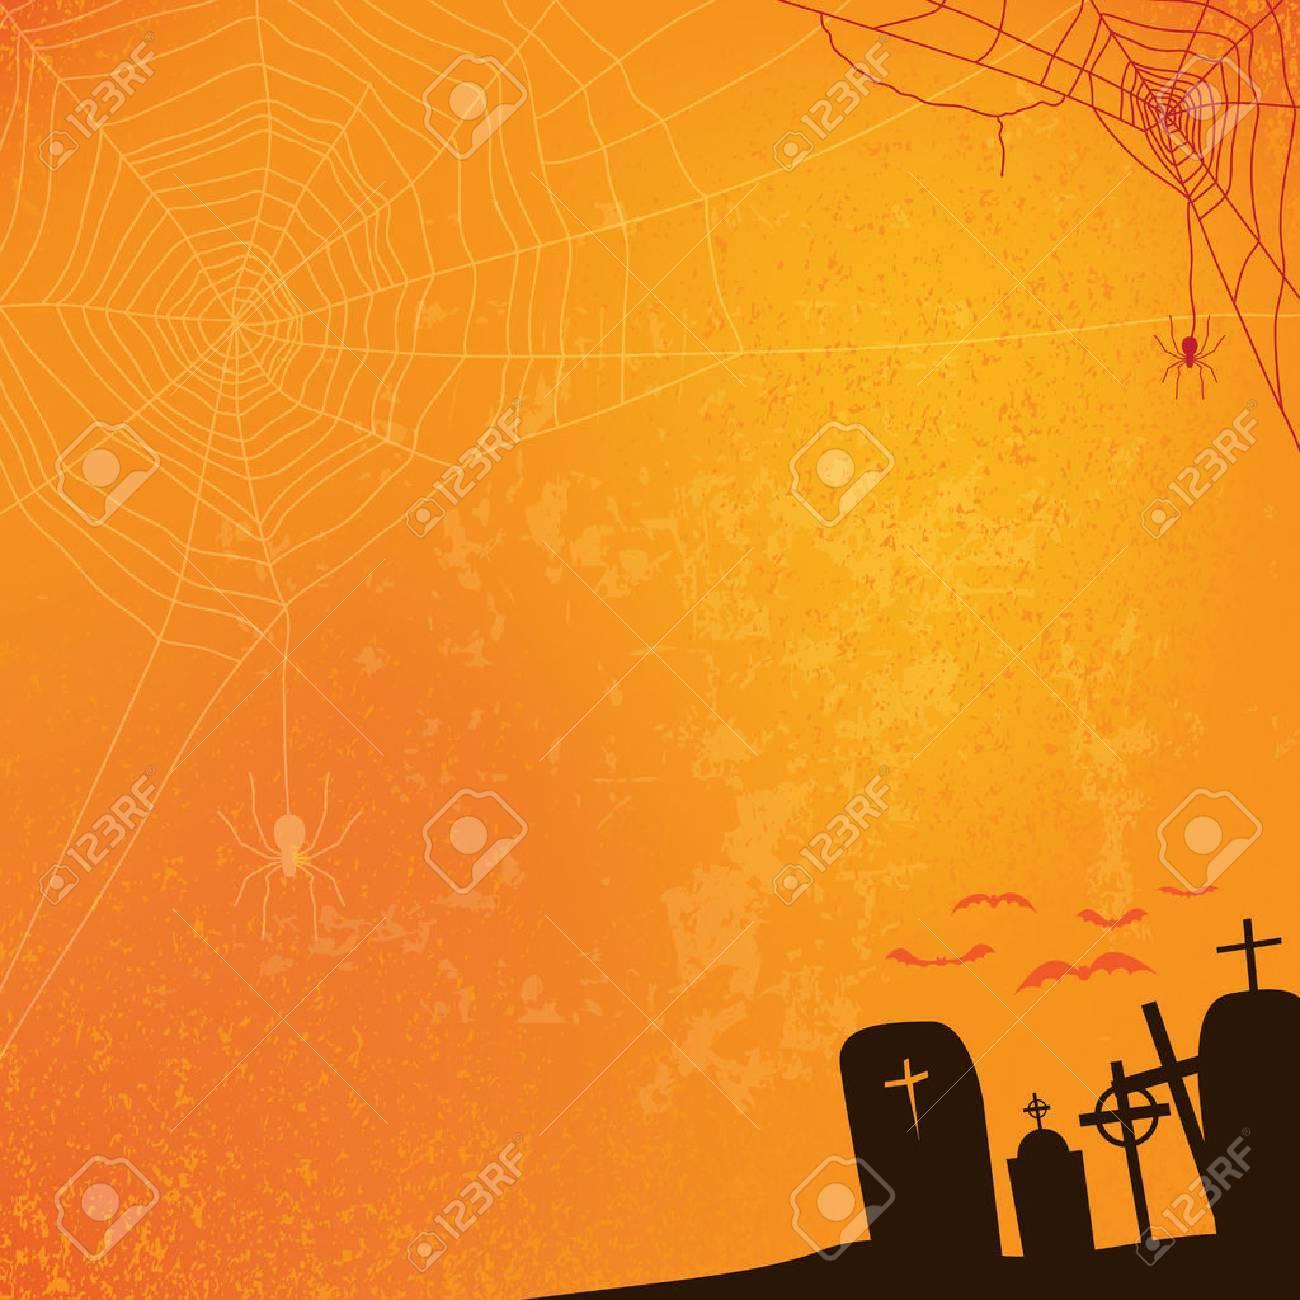 abstract halloween background, vector illustration - 45670199